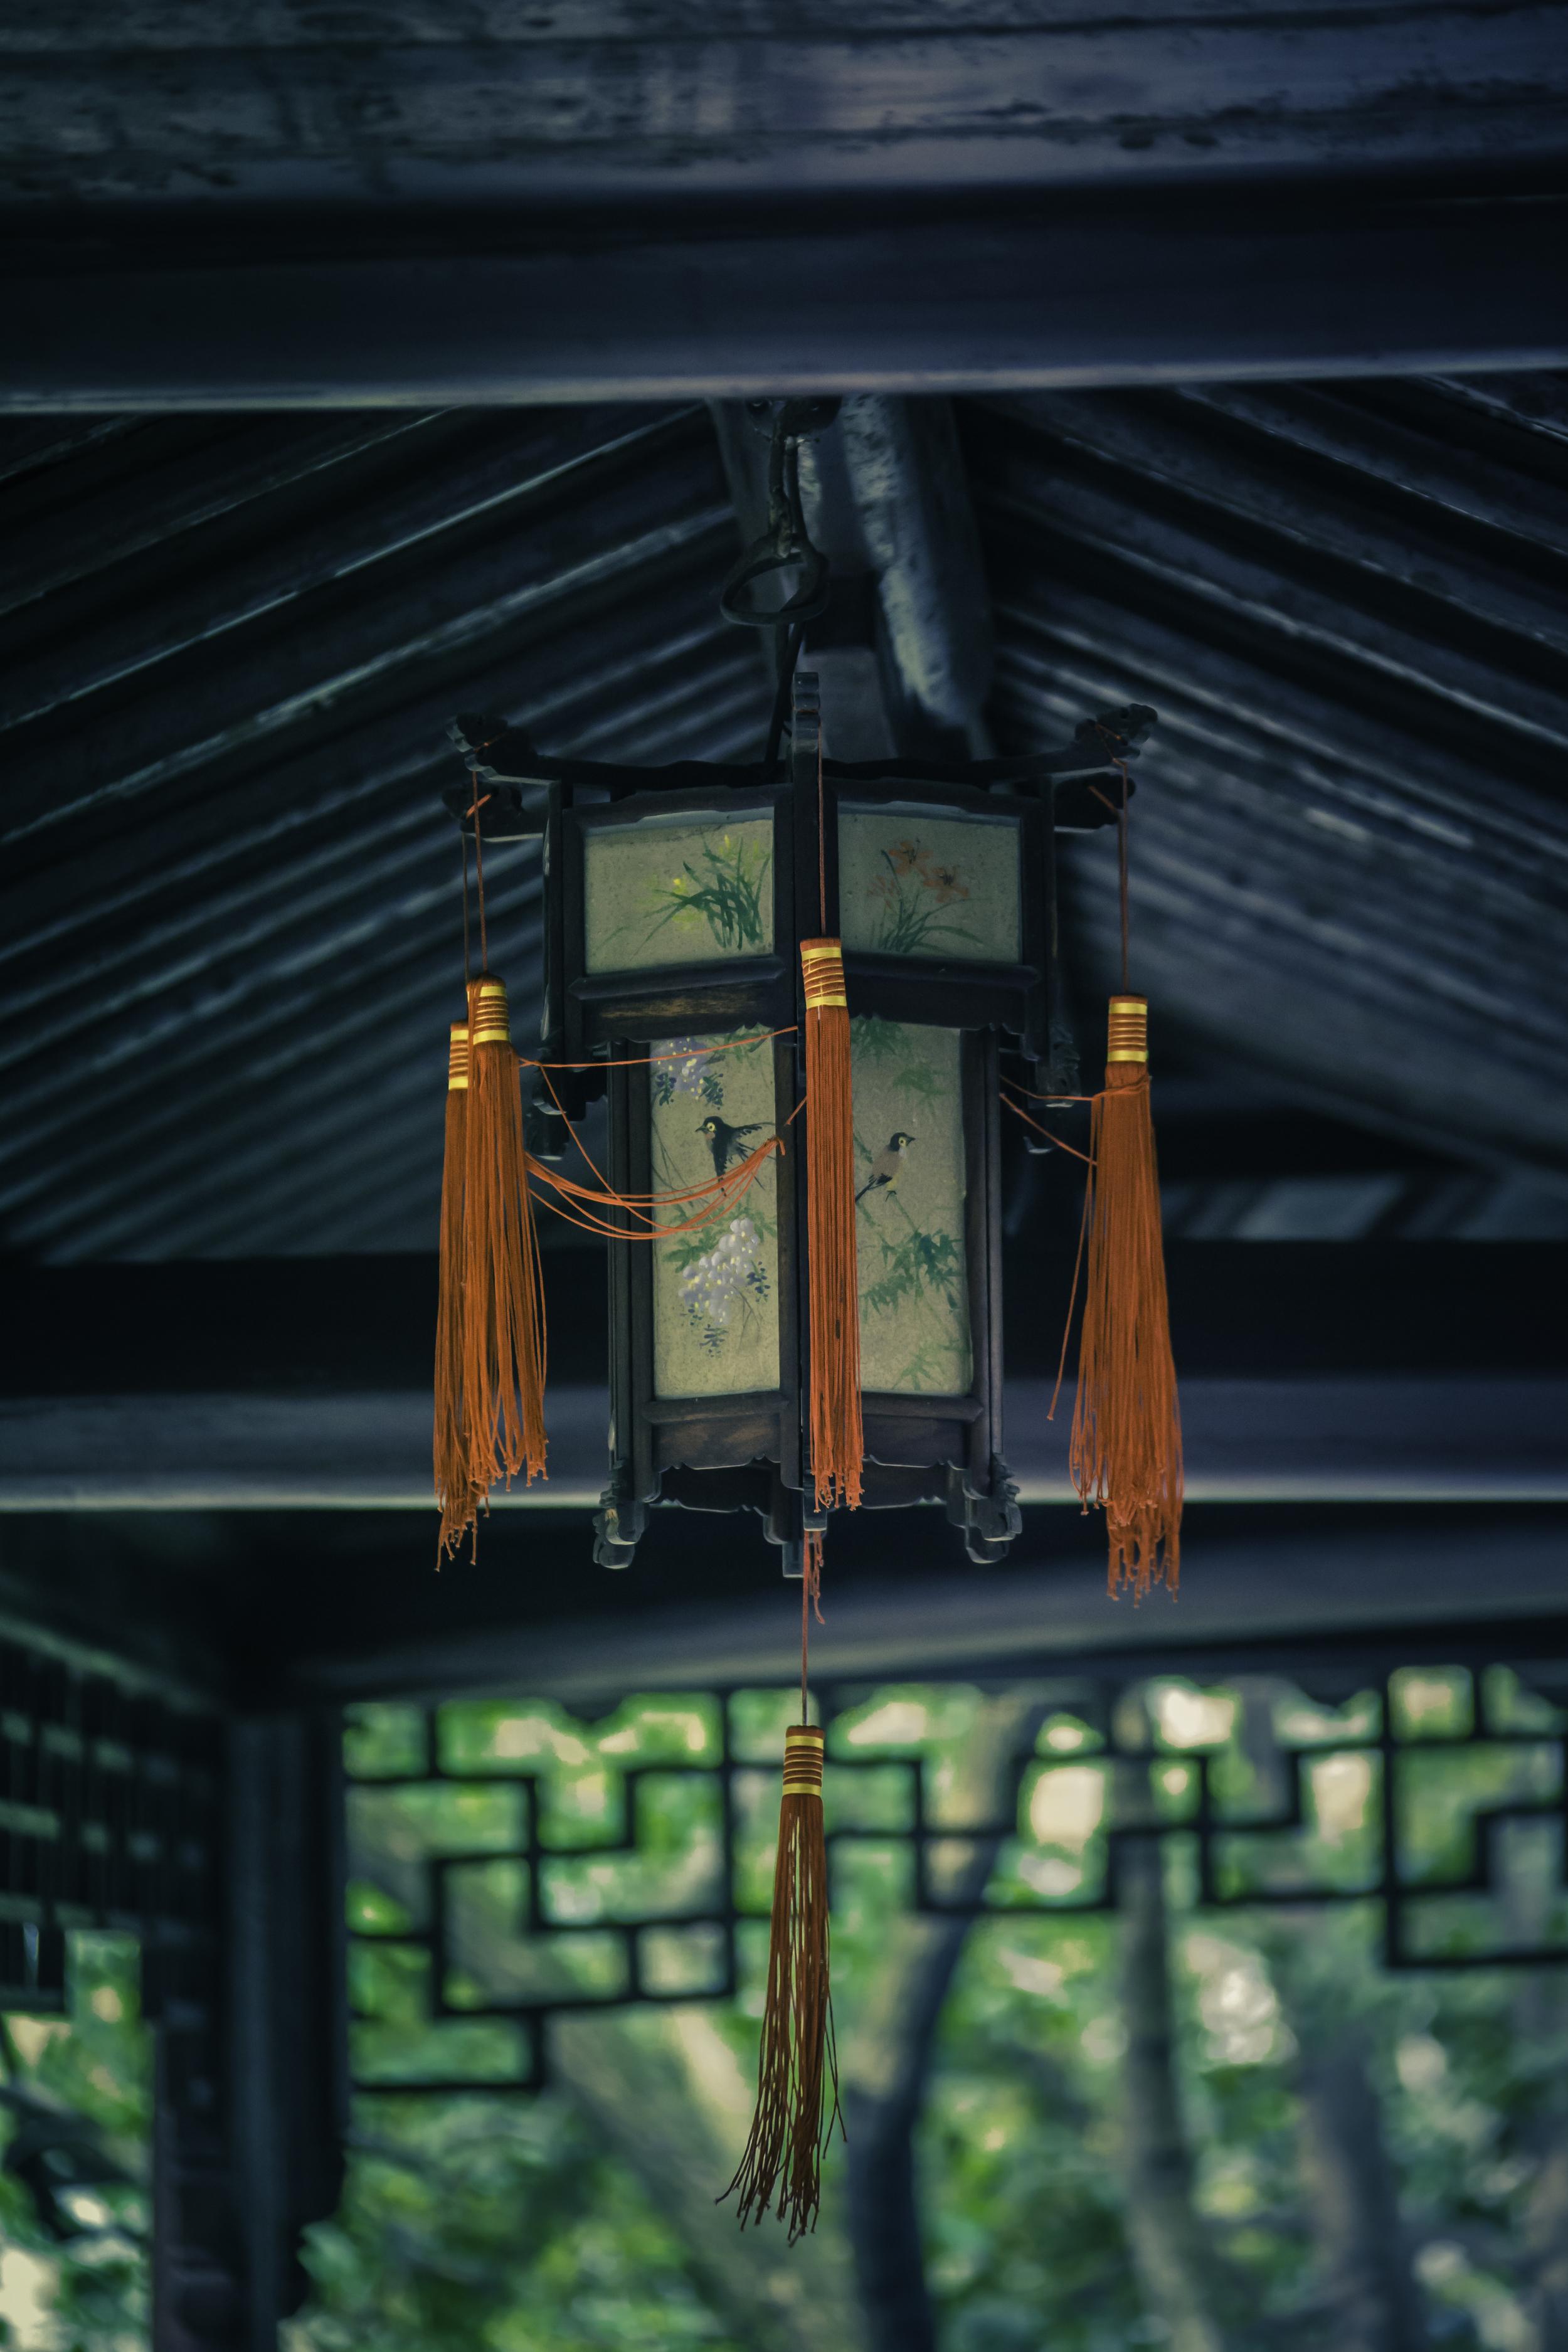 The Lingering Lantern